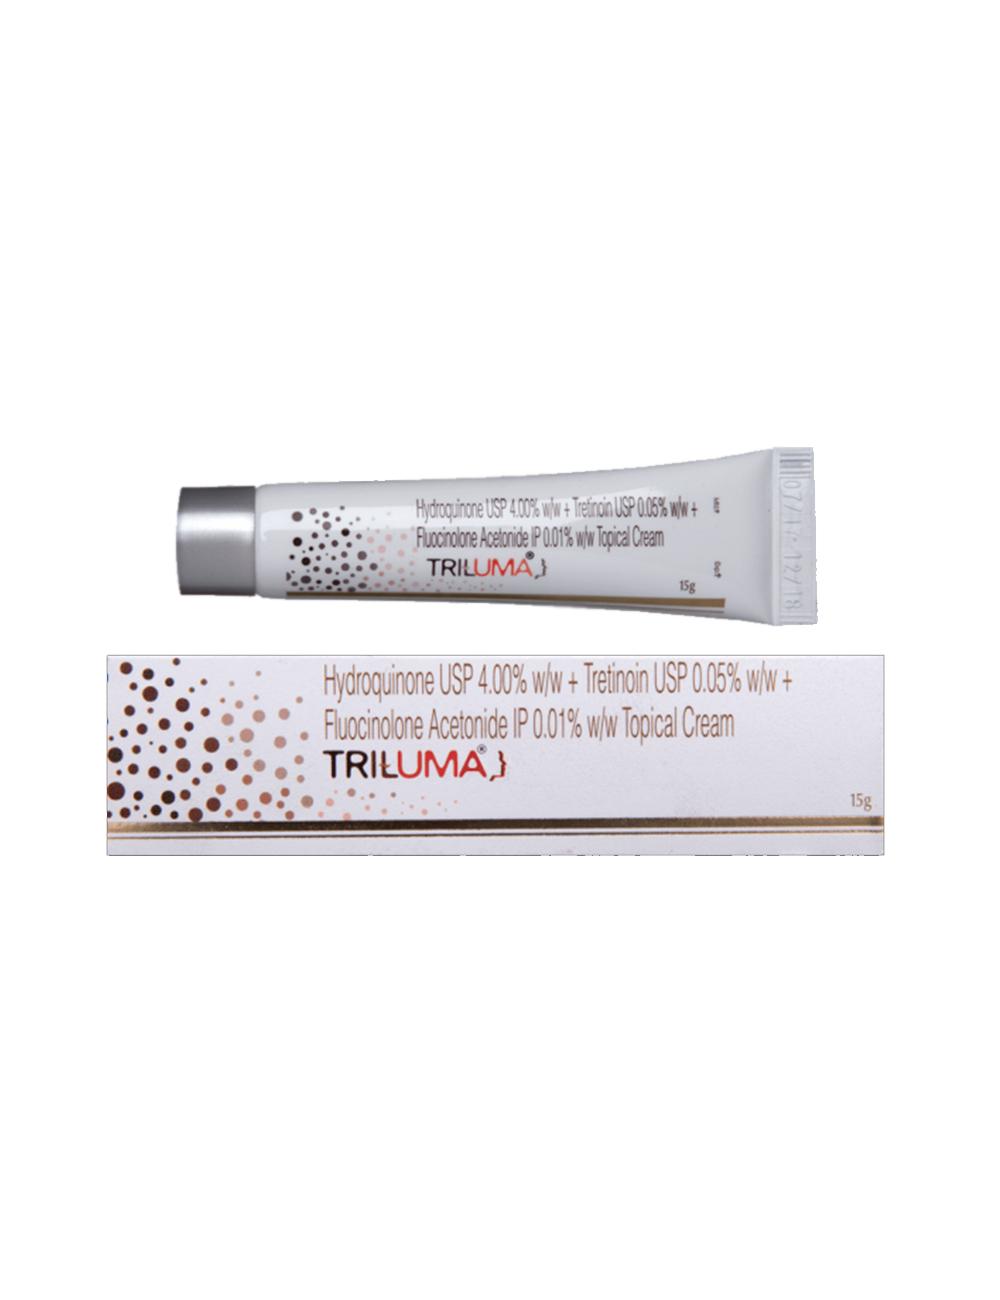 enalapril hydrochlorothiazide 20mg 12.5 mg spc